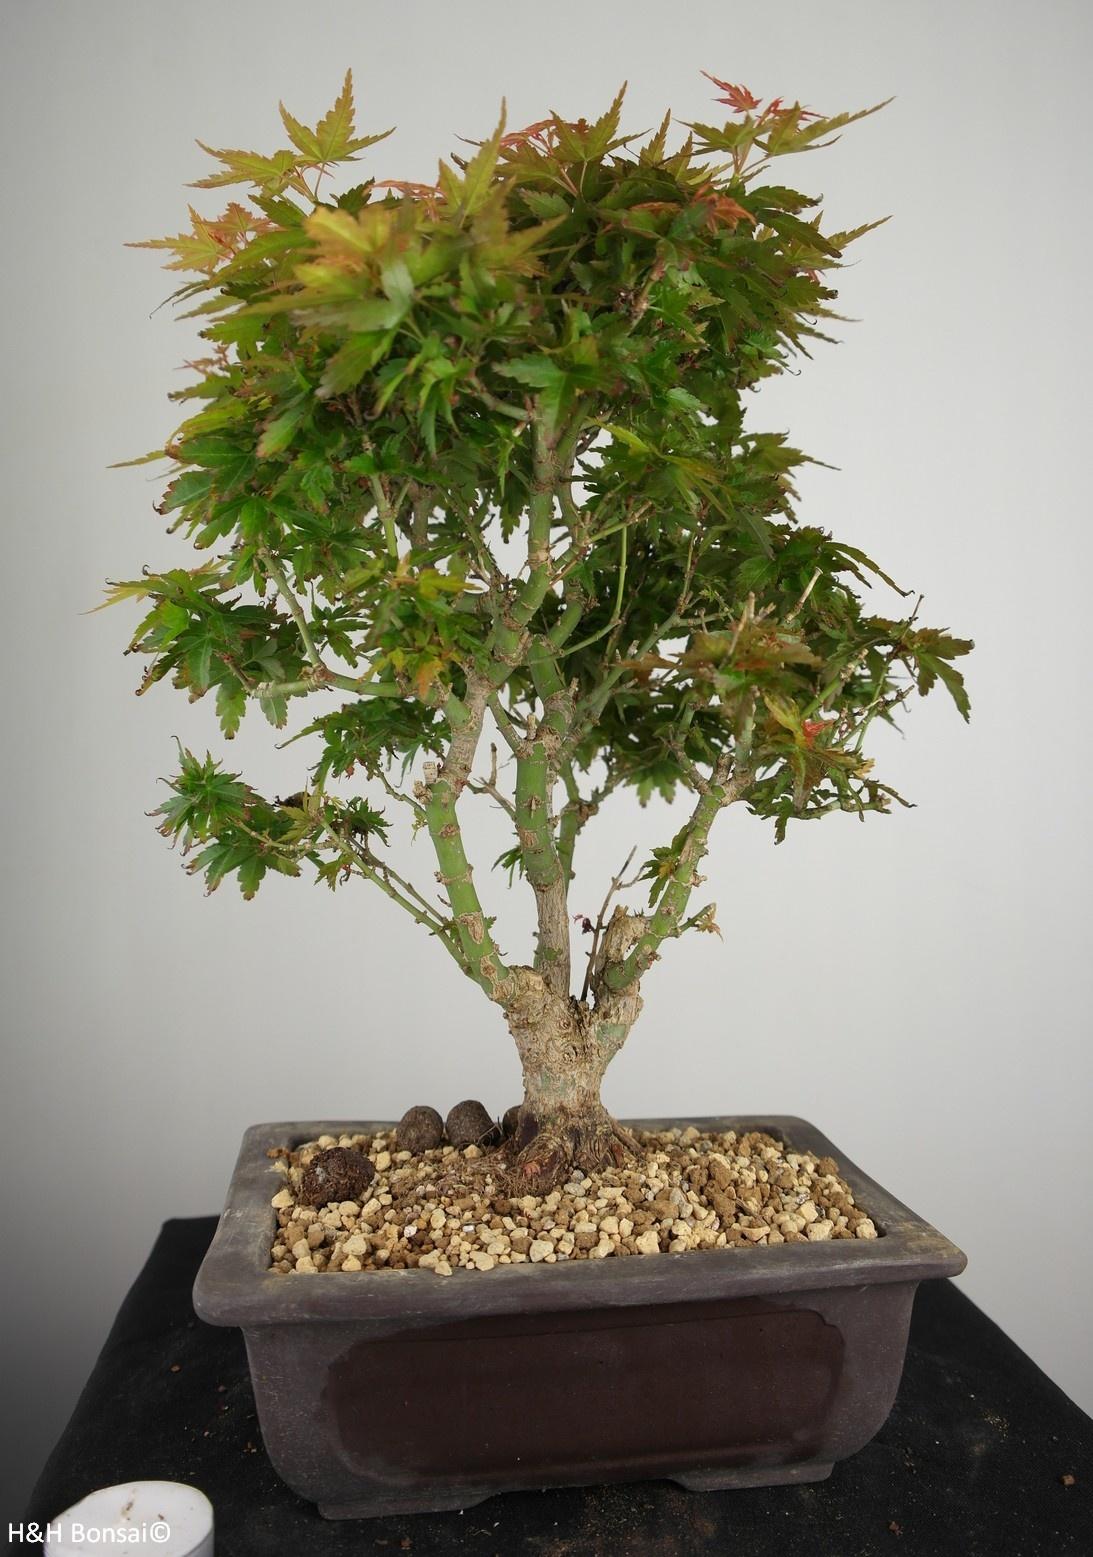 Bonsai Acer palmatum Kotohime, Japanse esdoorn, nr. 7694